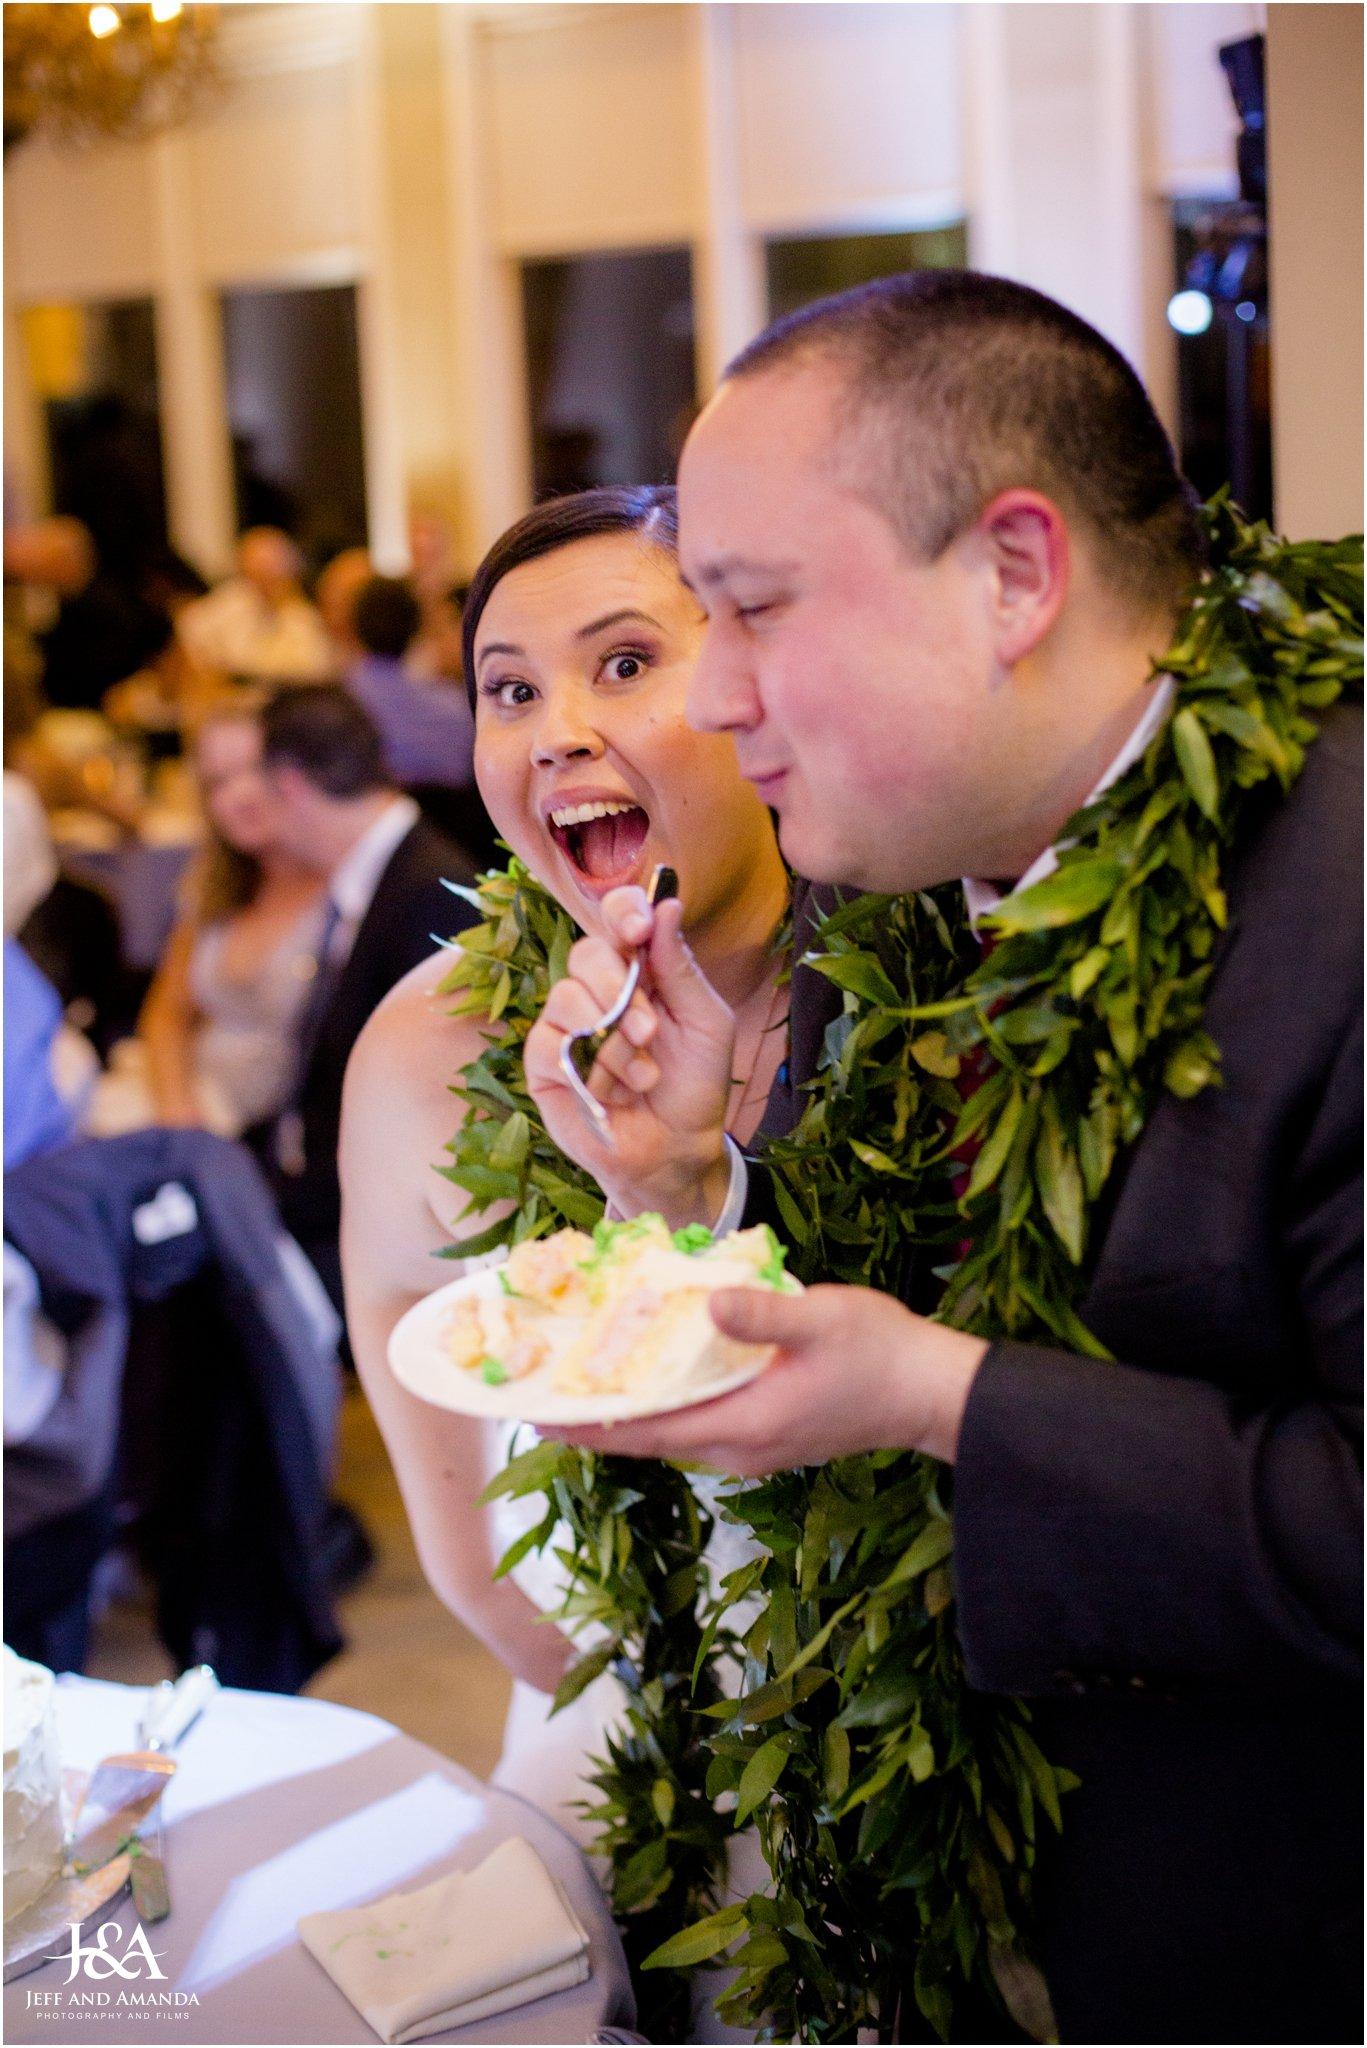 Dave and Kari s Wedding-Facebook Ready-0578.jpg